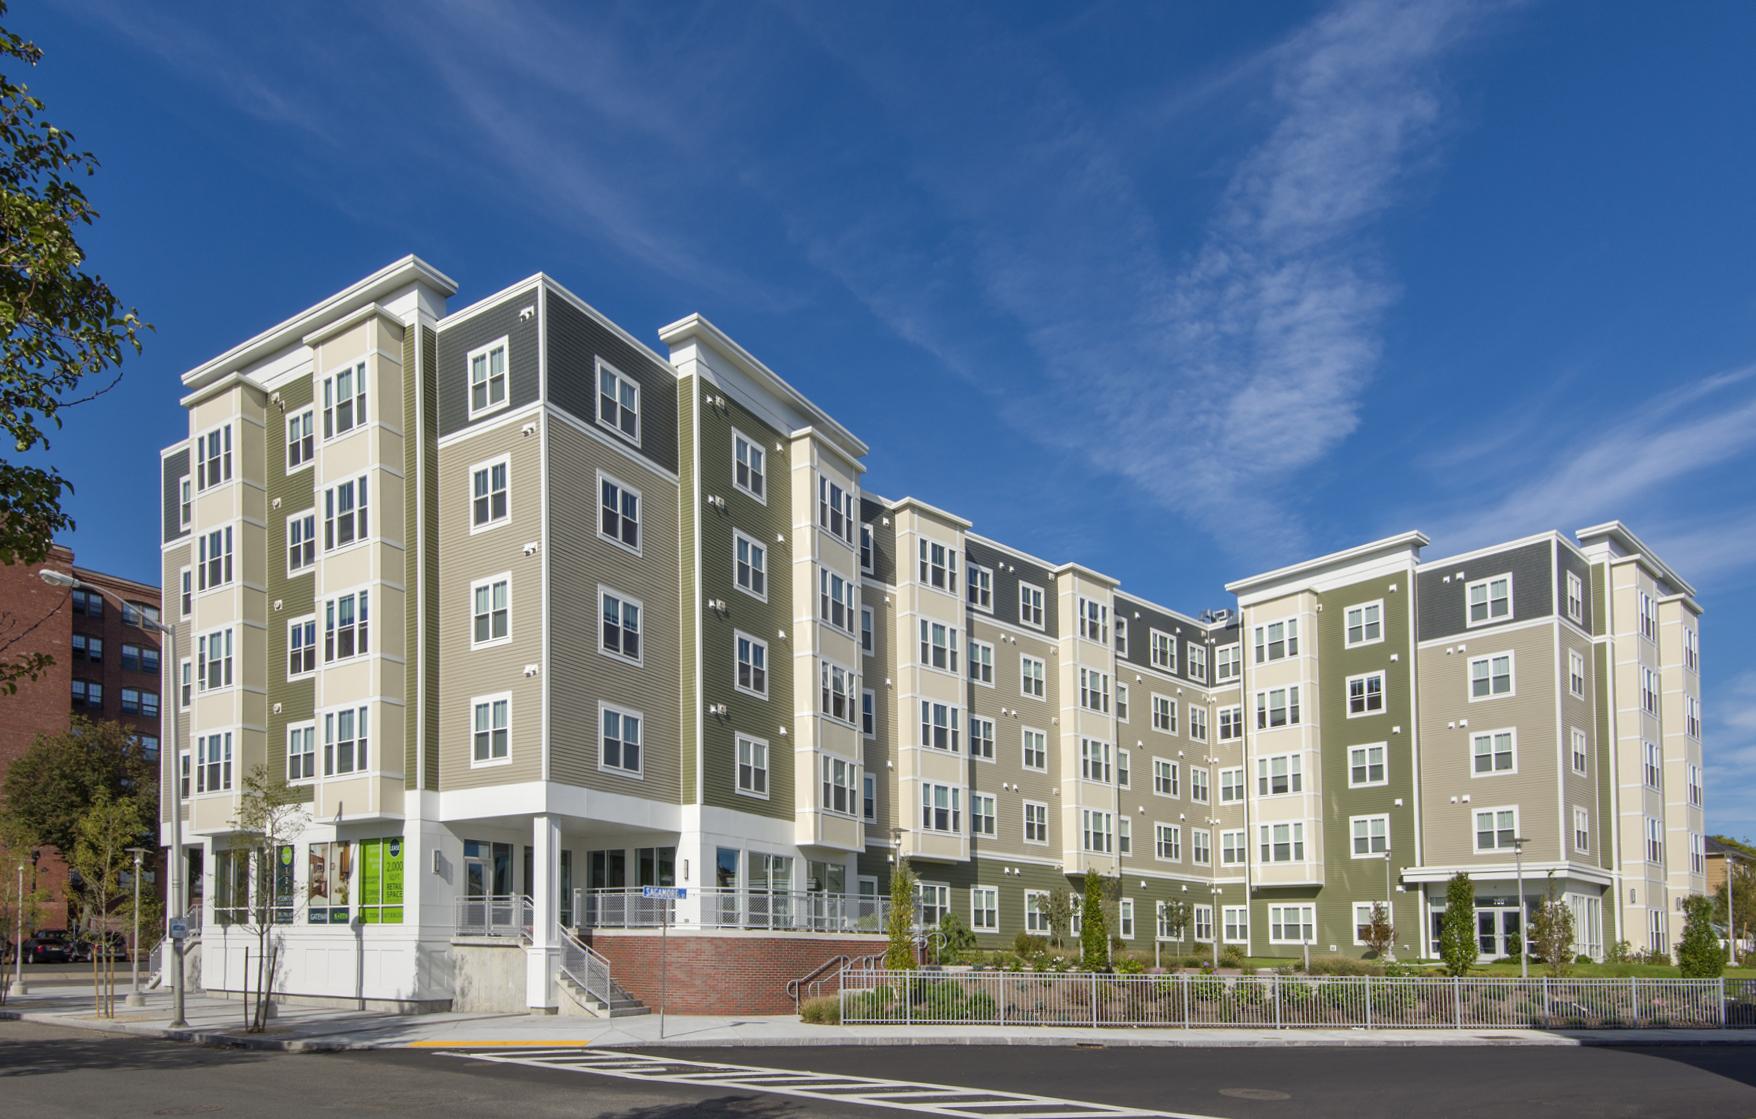 NAHMA's Affordable Housing Vanguard Award